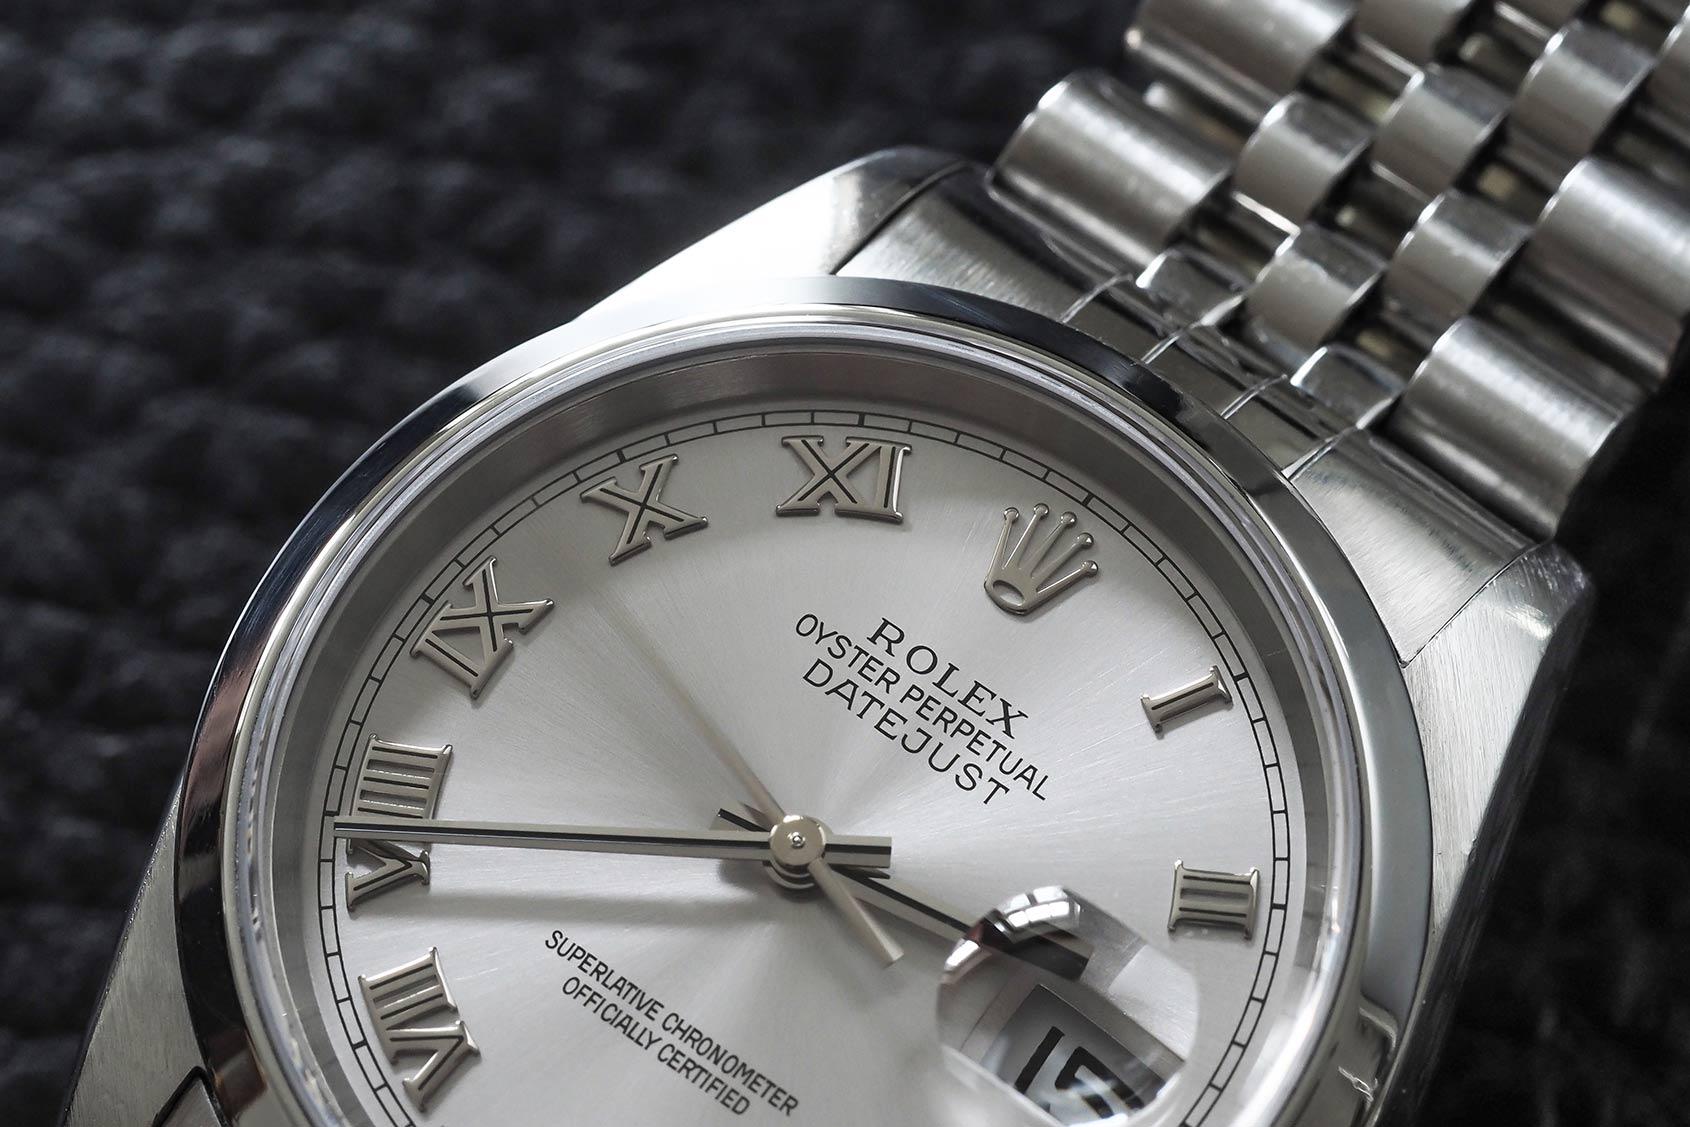 0124c9b1ede Replica Rolex Datejust 116200 White Roman Dial Review From  http   www.bestpopwatch